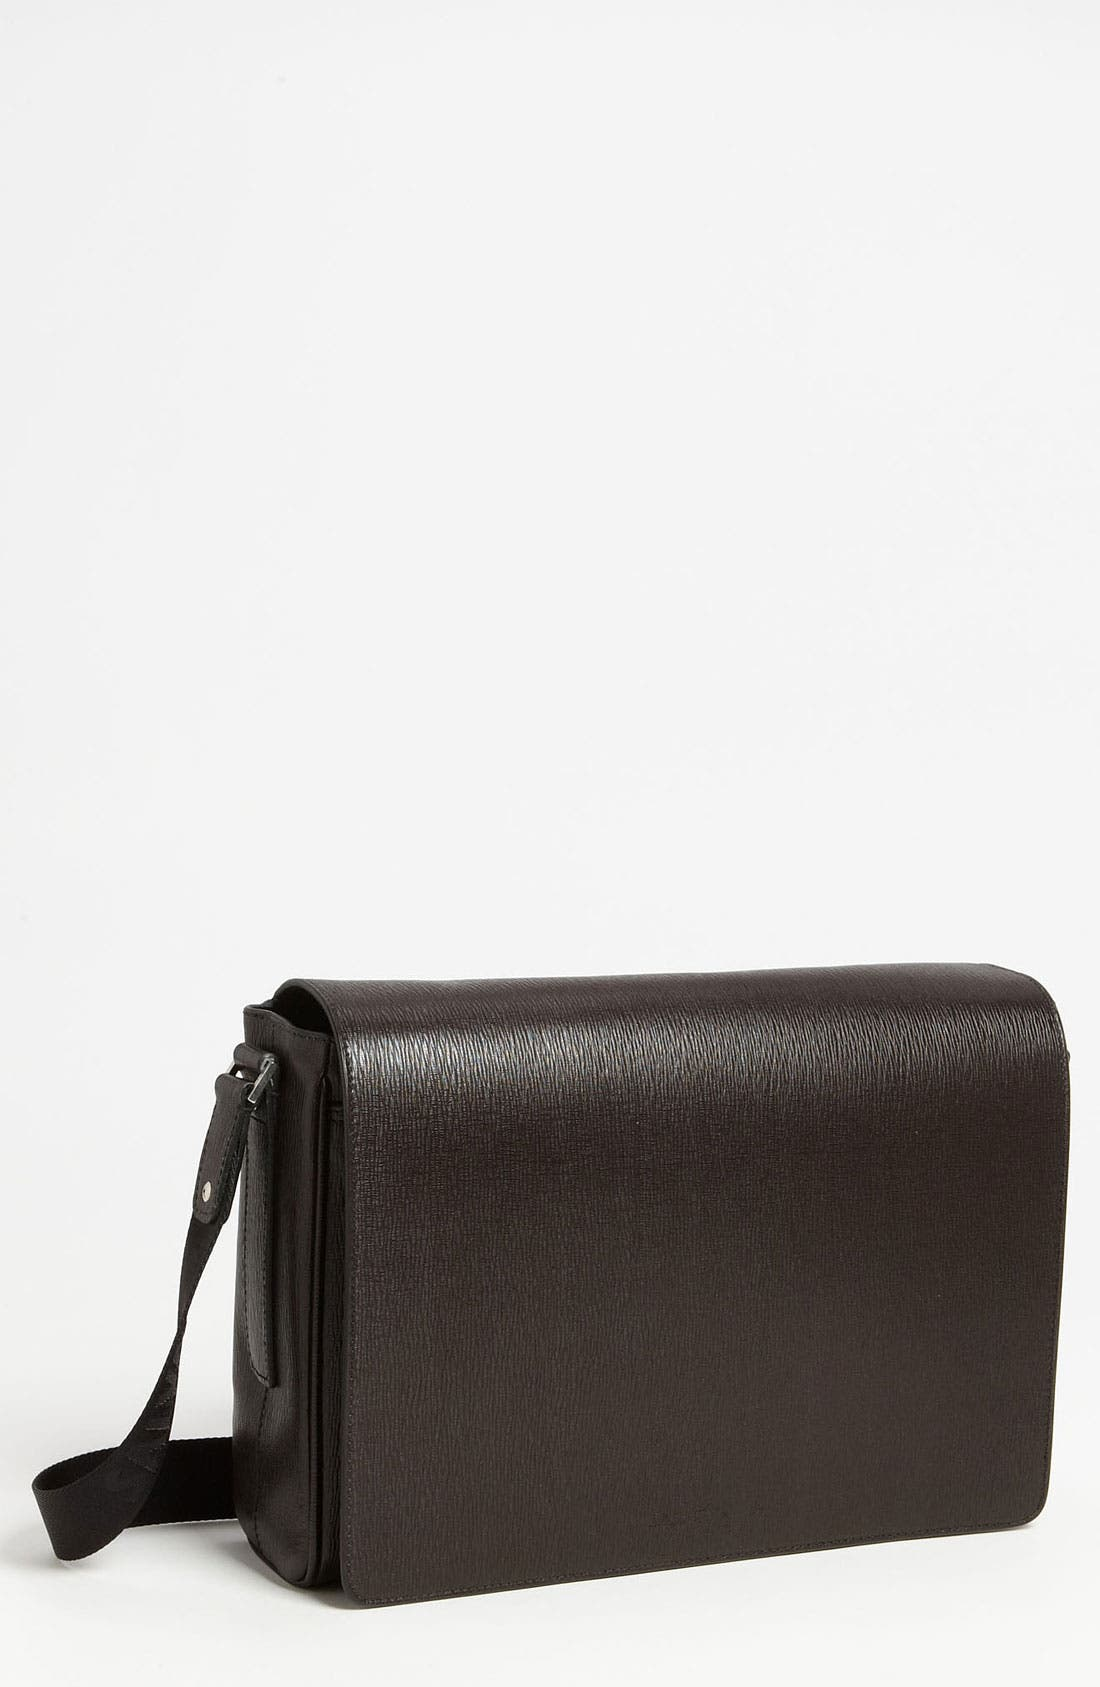 Main Image - Salvatore Ferragamo 'Revival' Messenger Bag